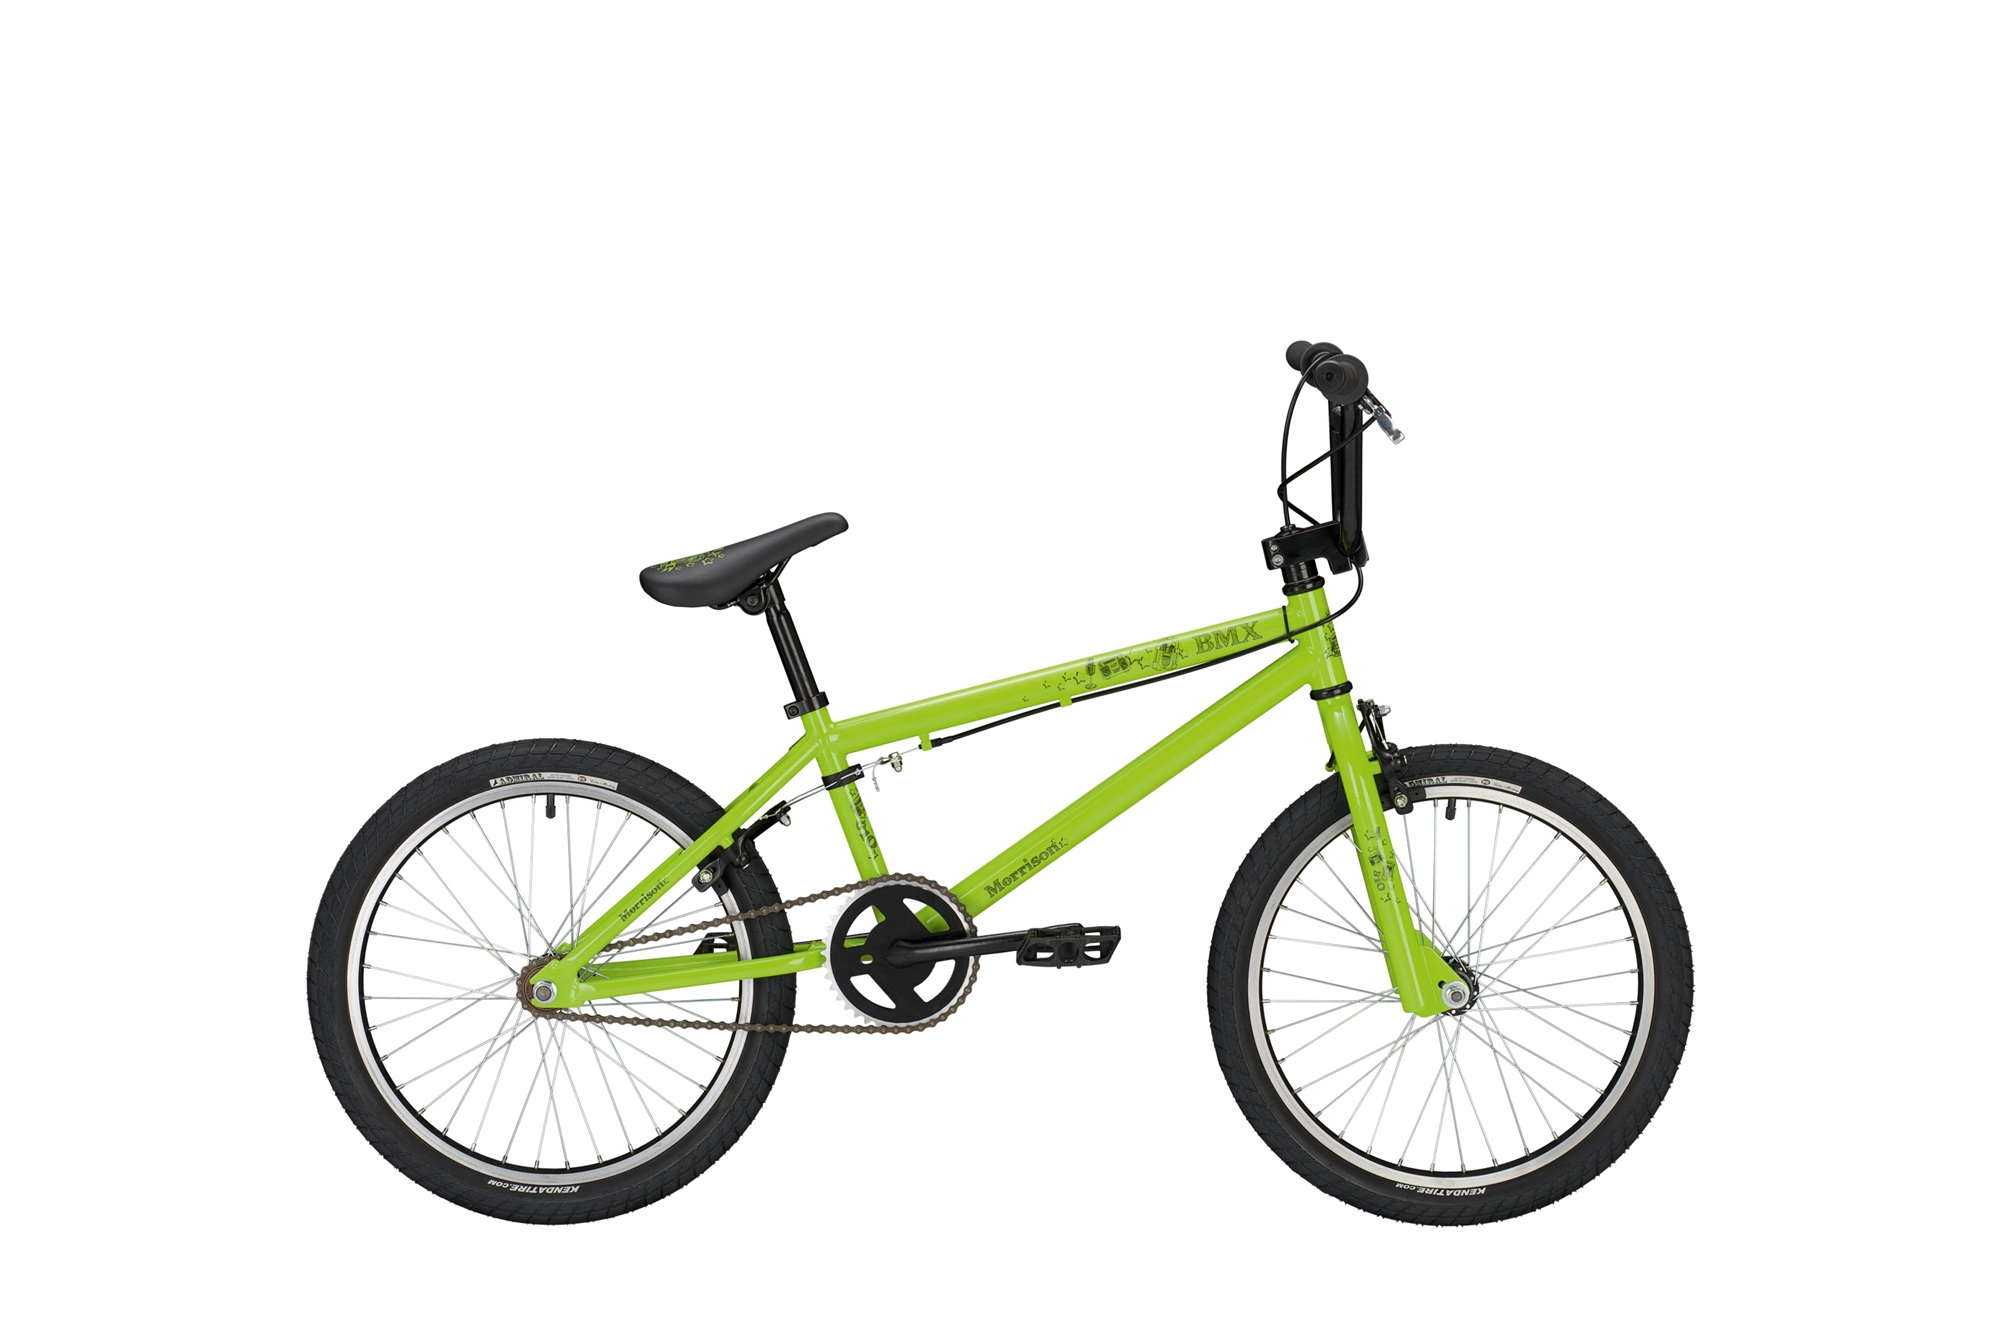 Morrison Fahrräder Dortmund - BMX Räder